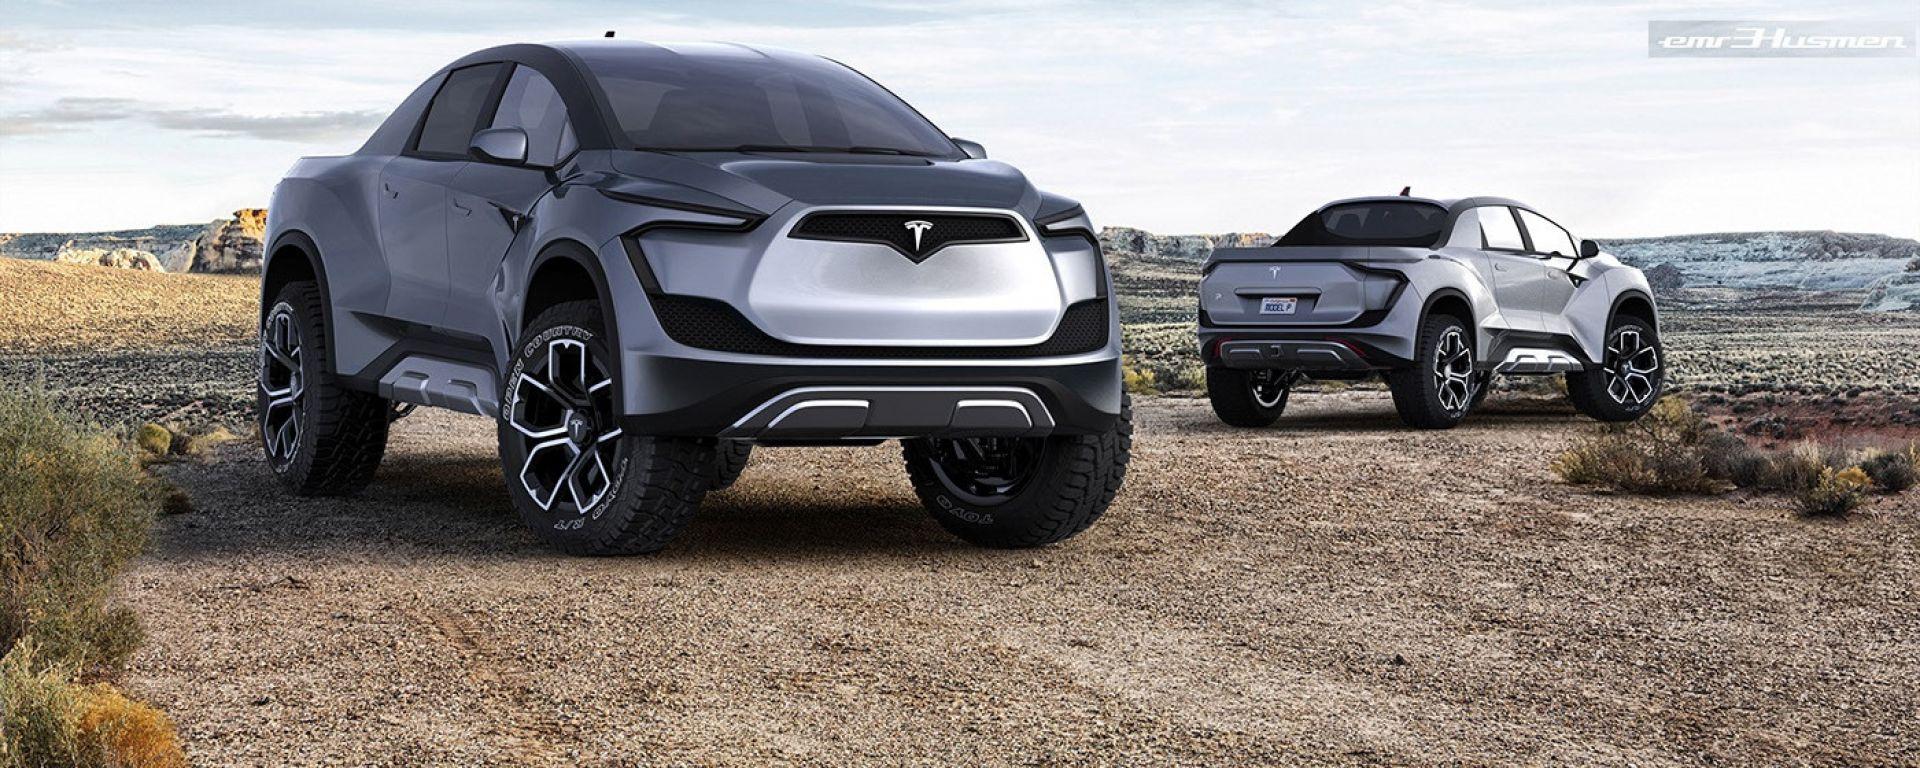 Tesla Pickup, rendering di Emre Husmen